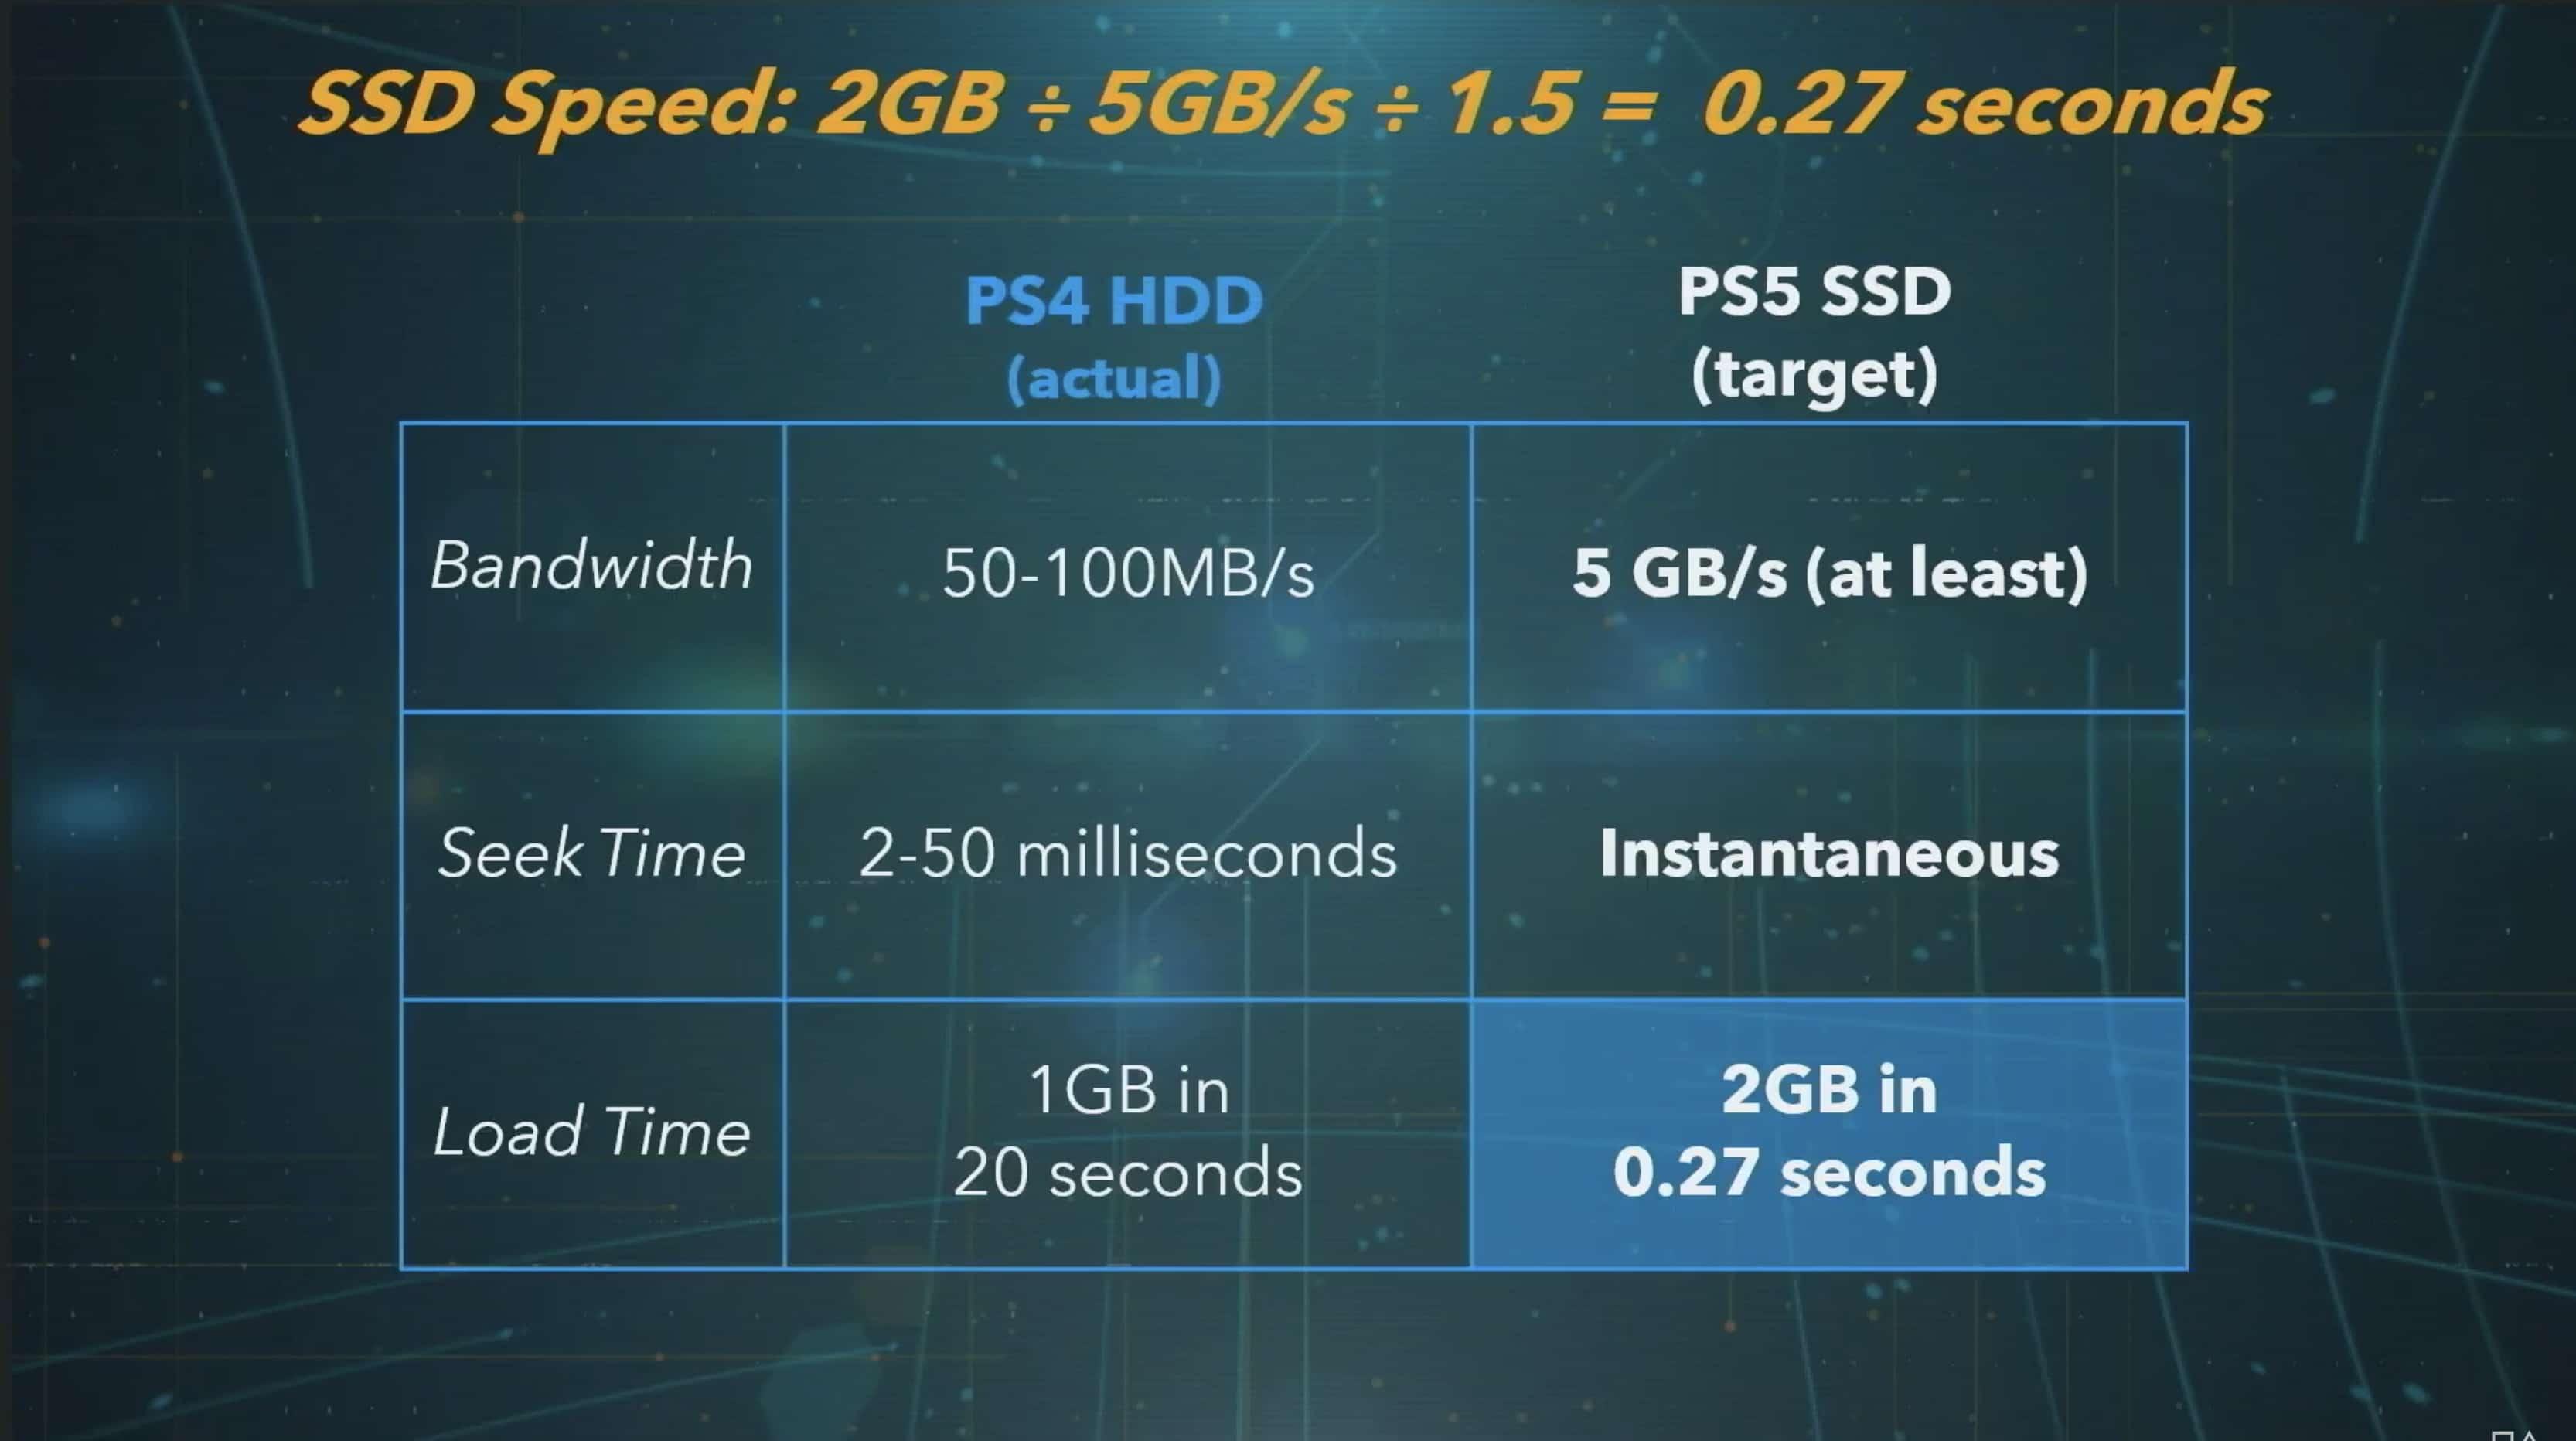 PS5 SSD vitesse